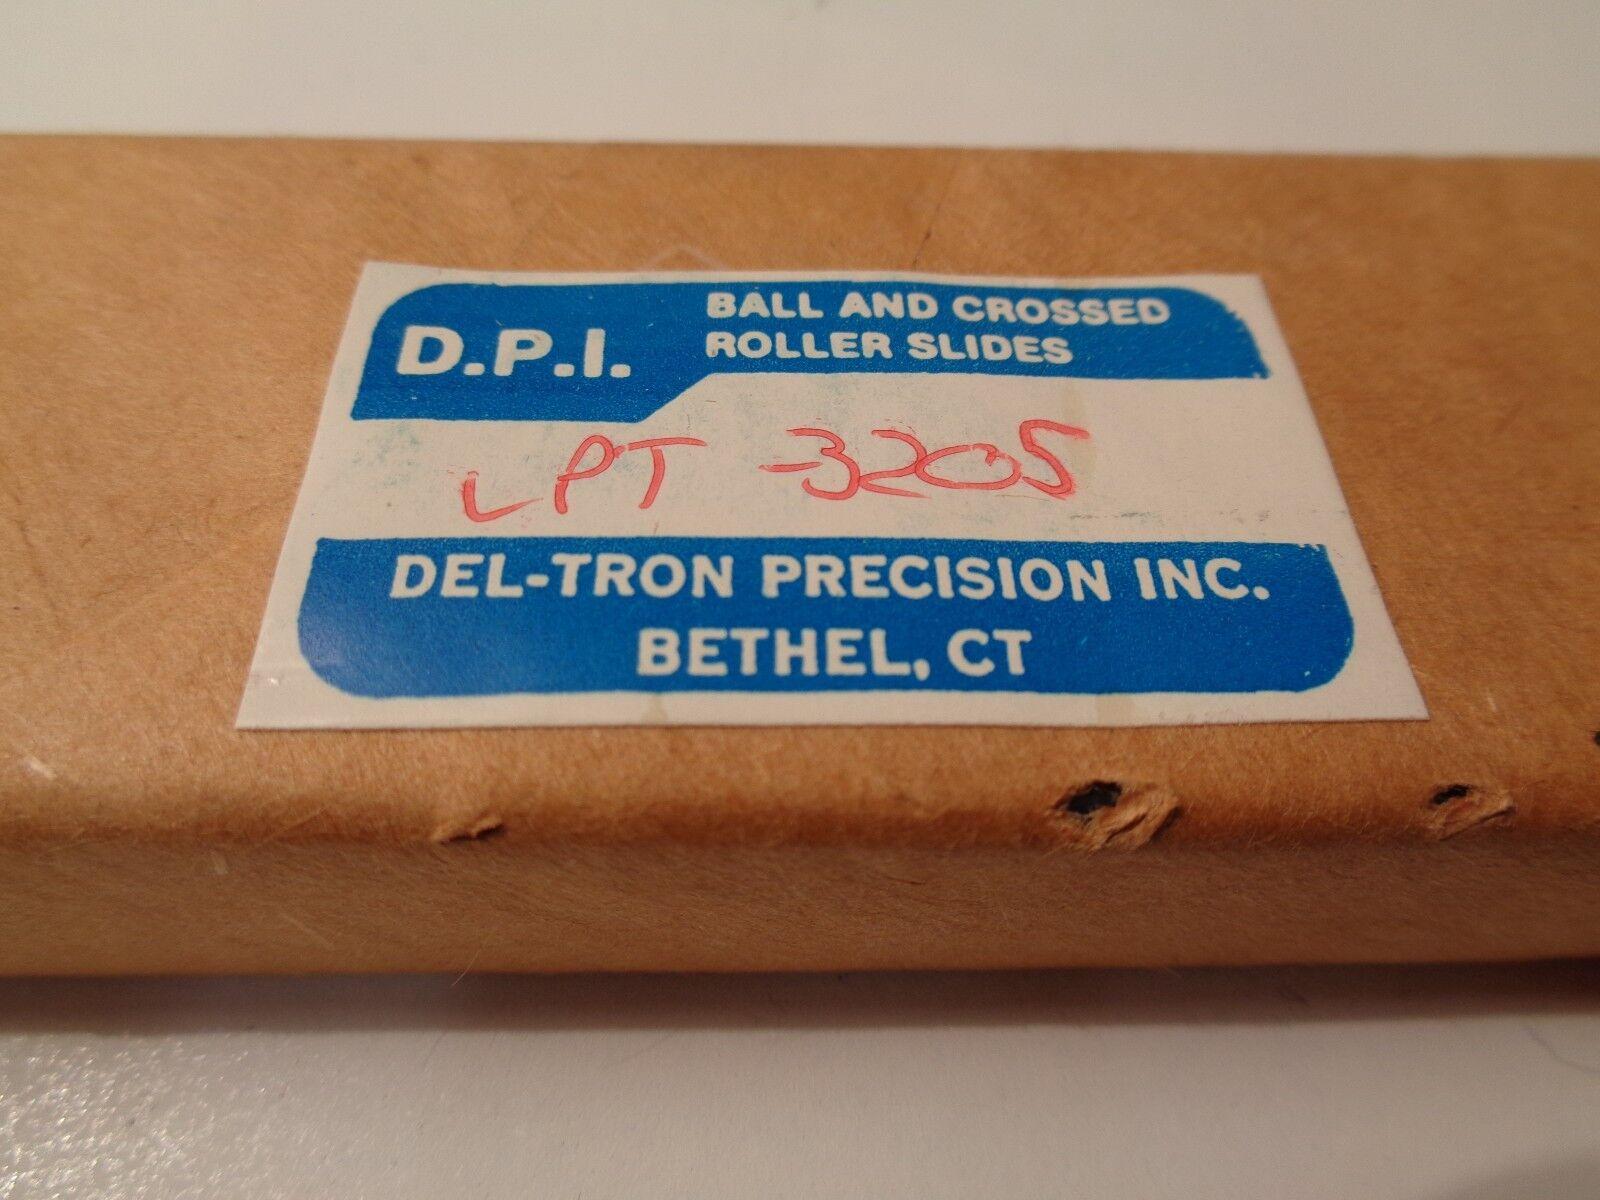 Del-Tron LPT-3205 Niedrig Profile Gekreuzt Roller Slide Slide Slide Tisch 04e960